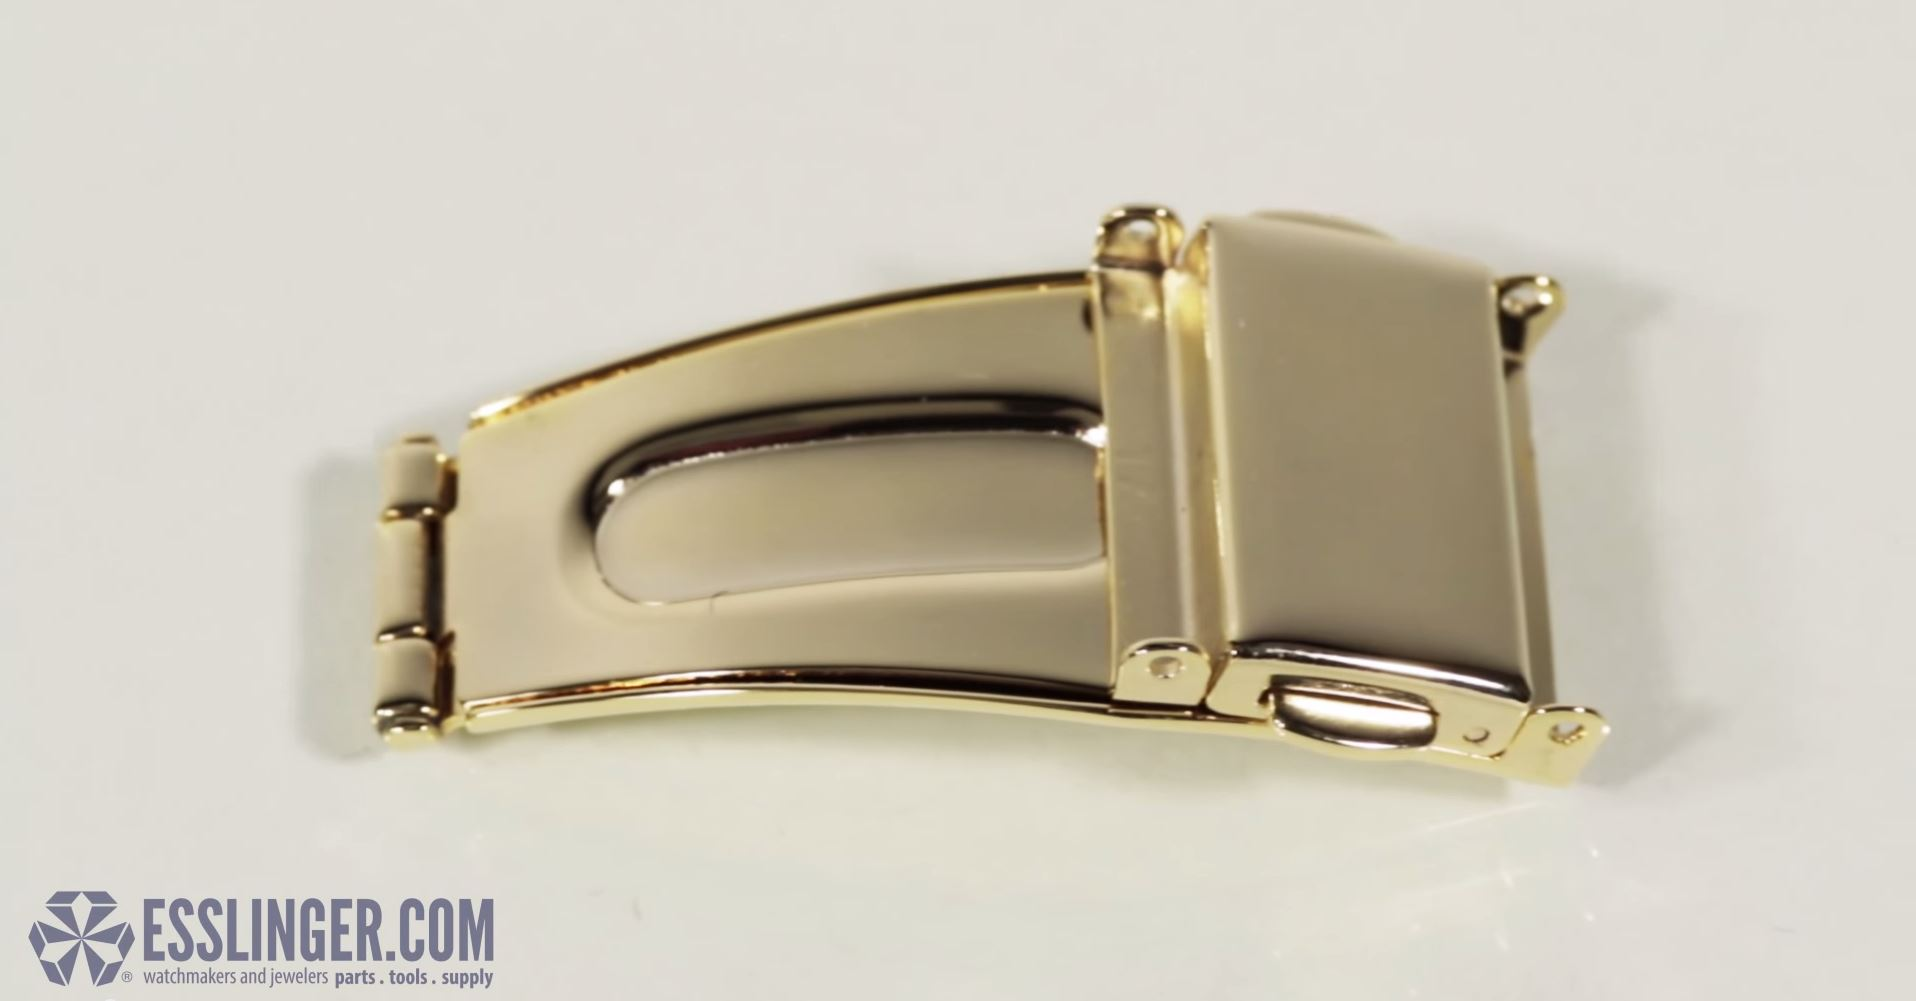 Watch Repair | Replacing Watch Band Clasp